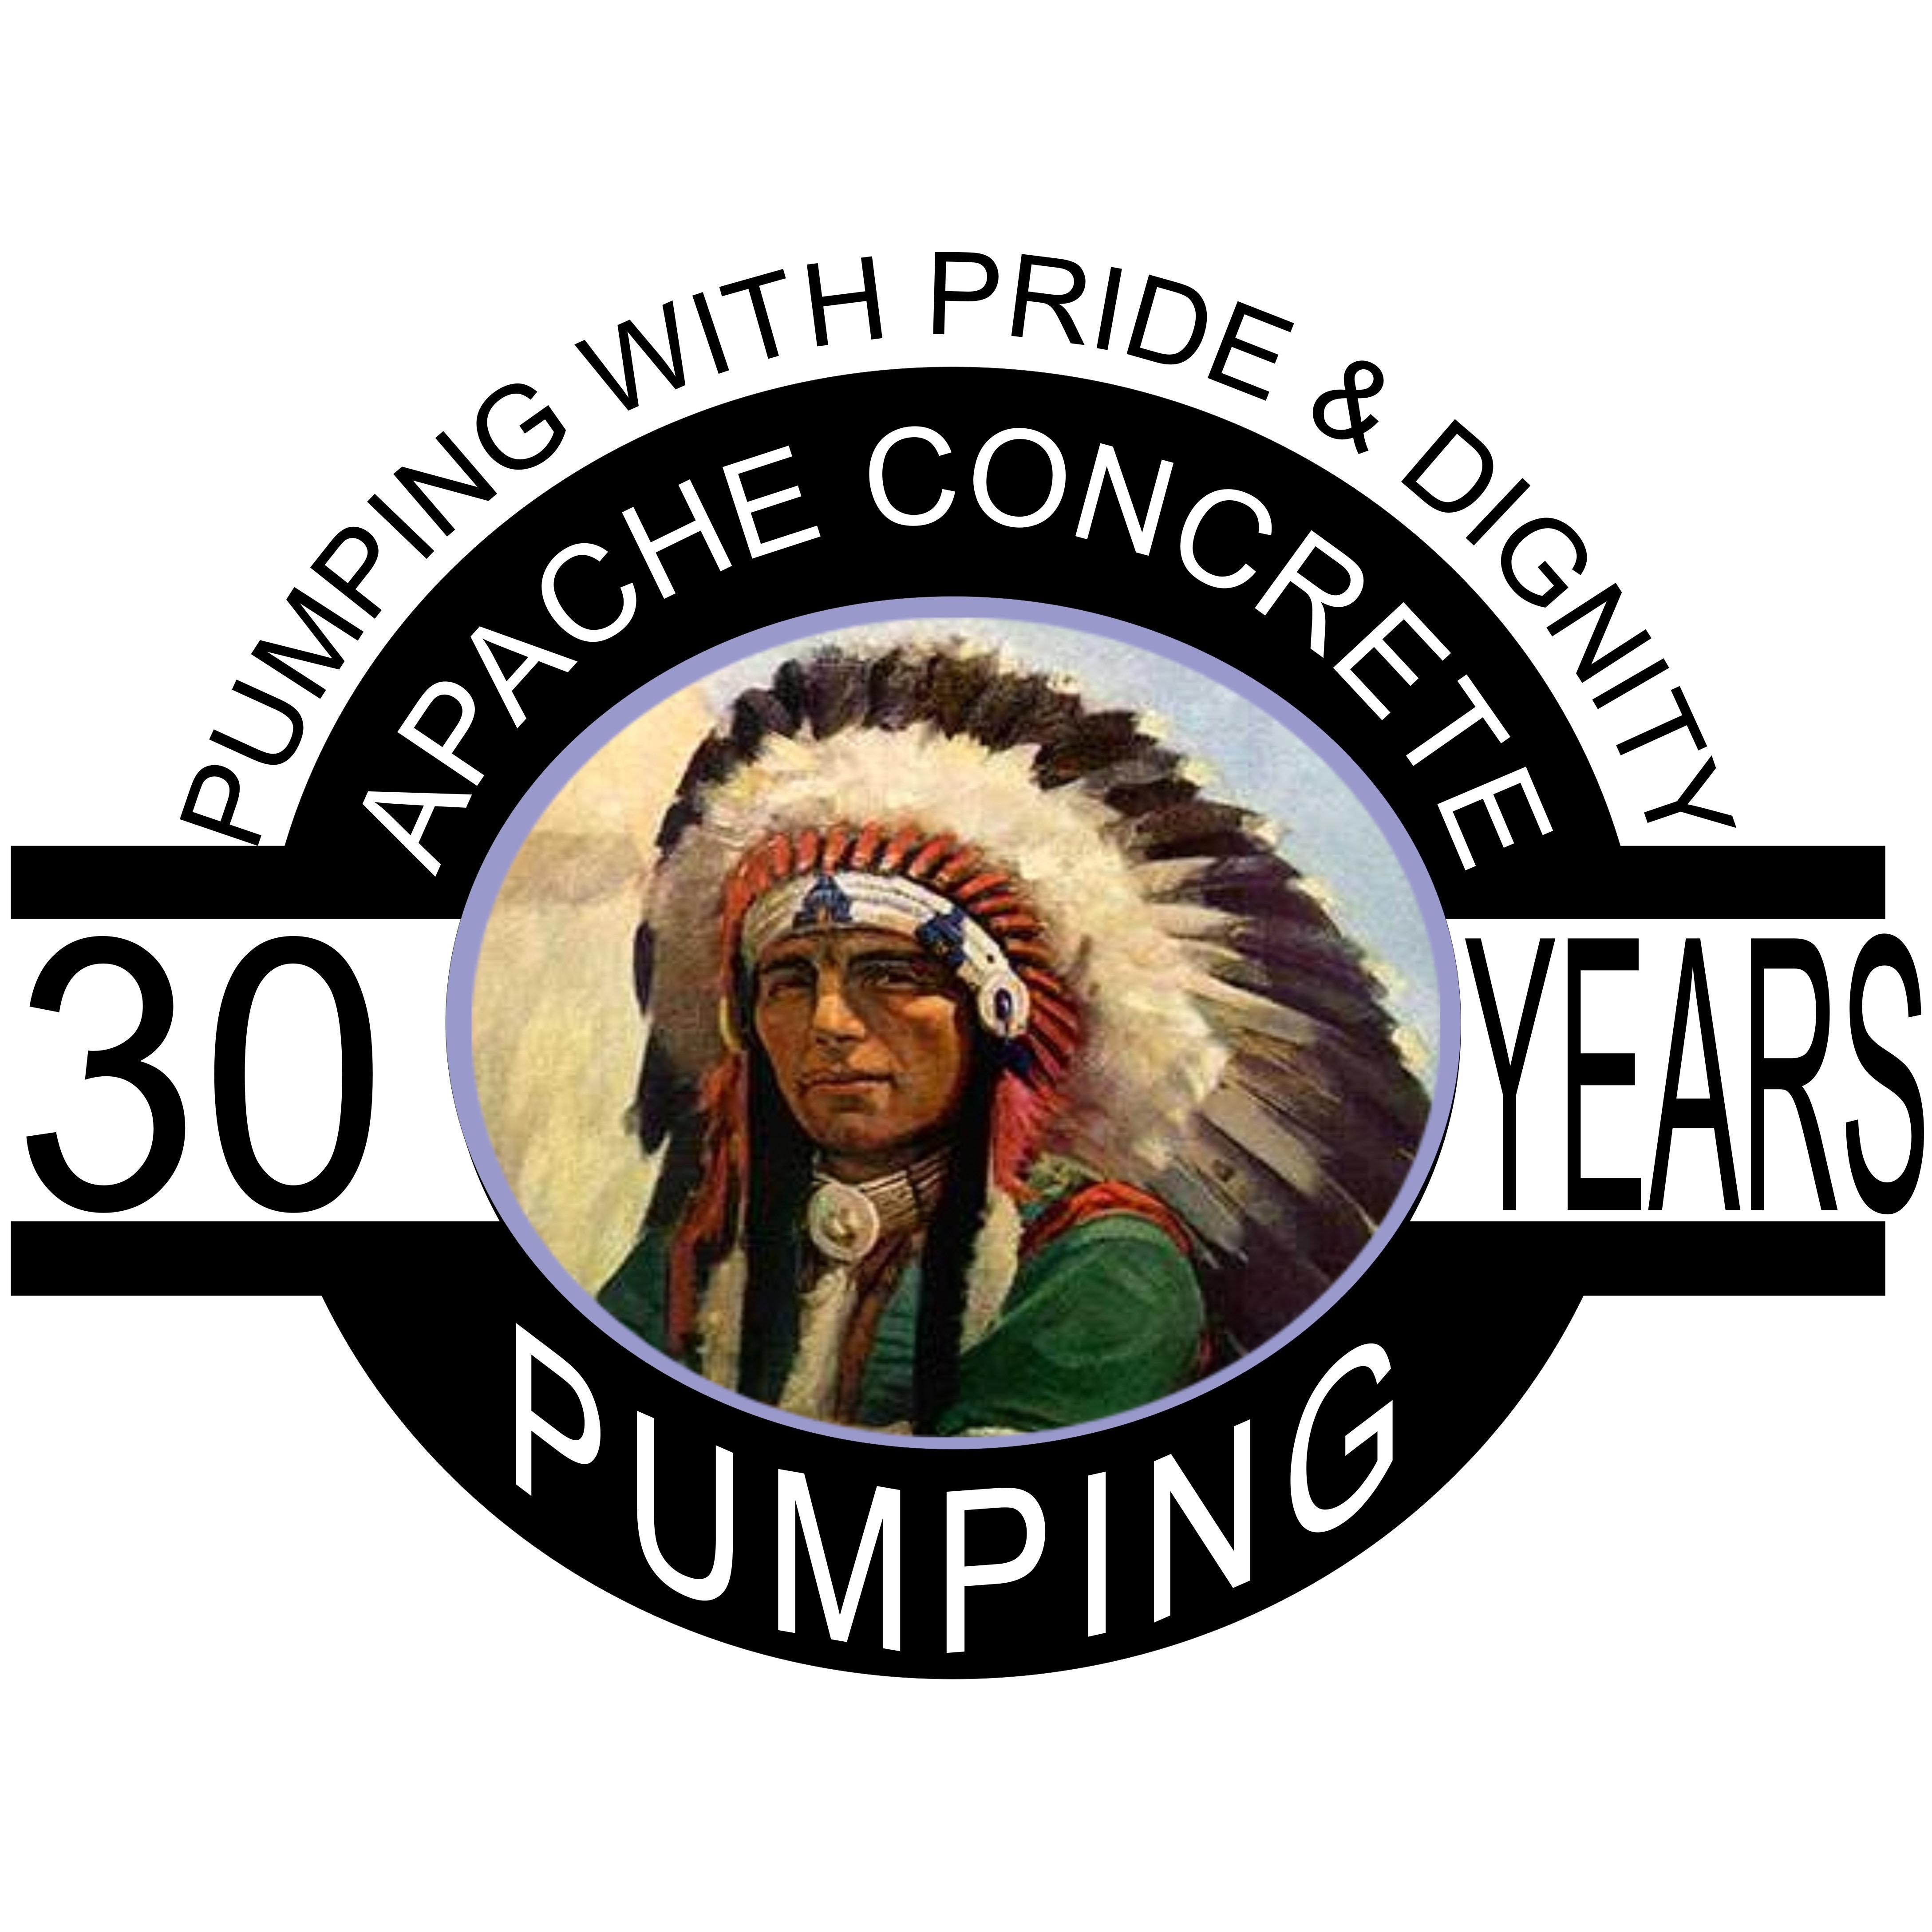 Apache Concrete Pumping